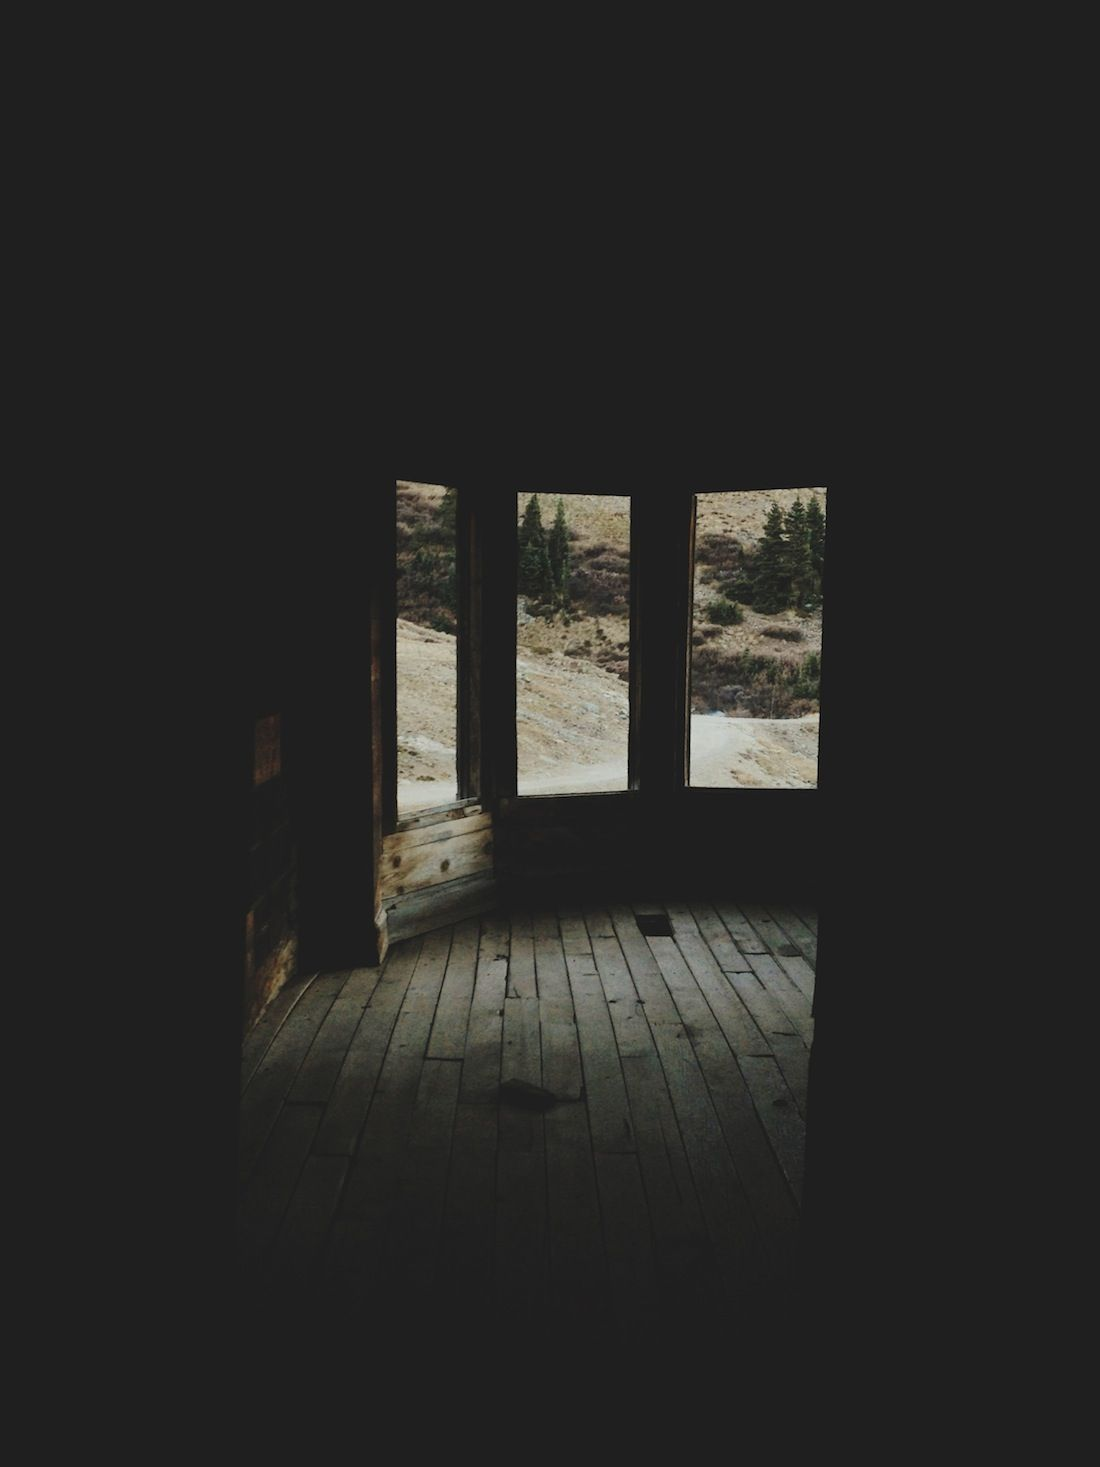 Dark empty room with window - House